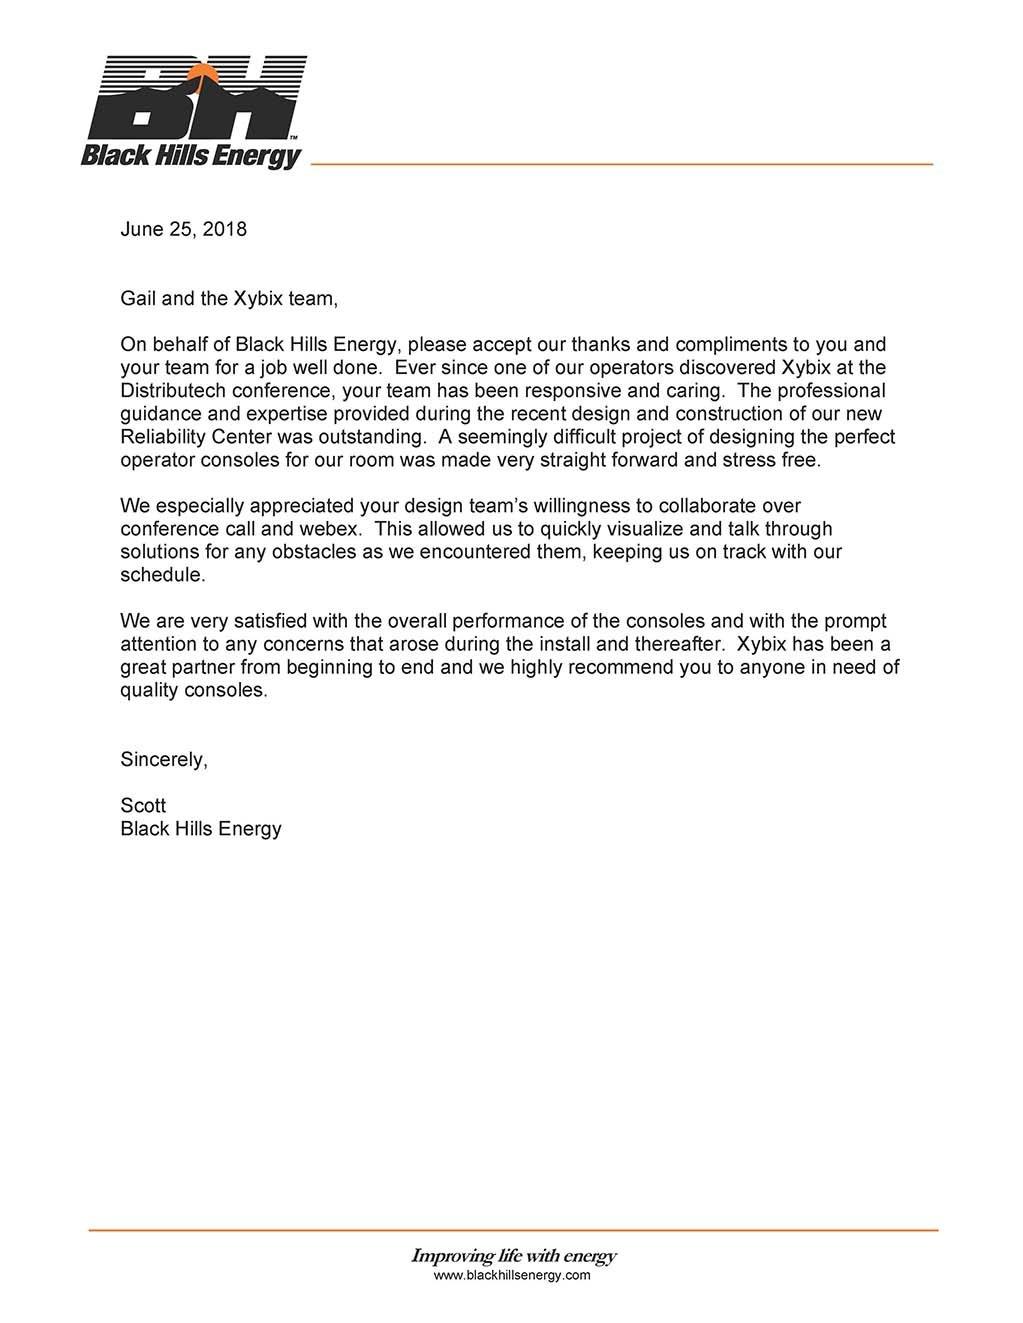 Black Hills Energy - Xybix Reference Letter